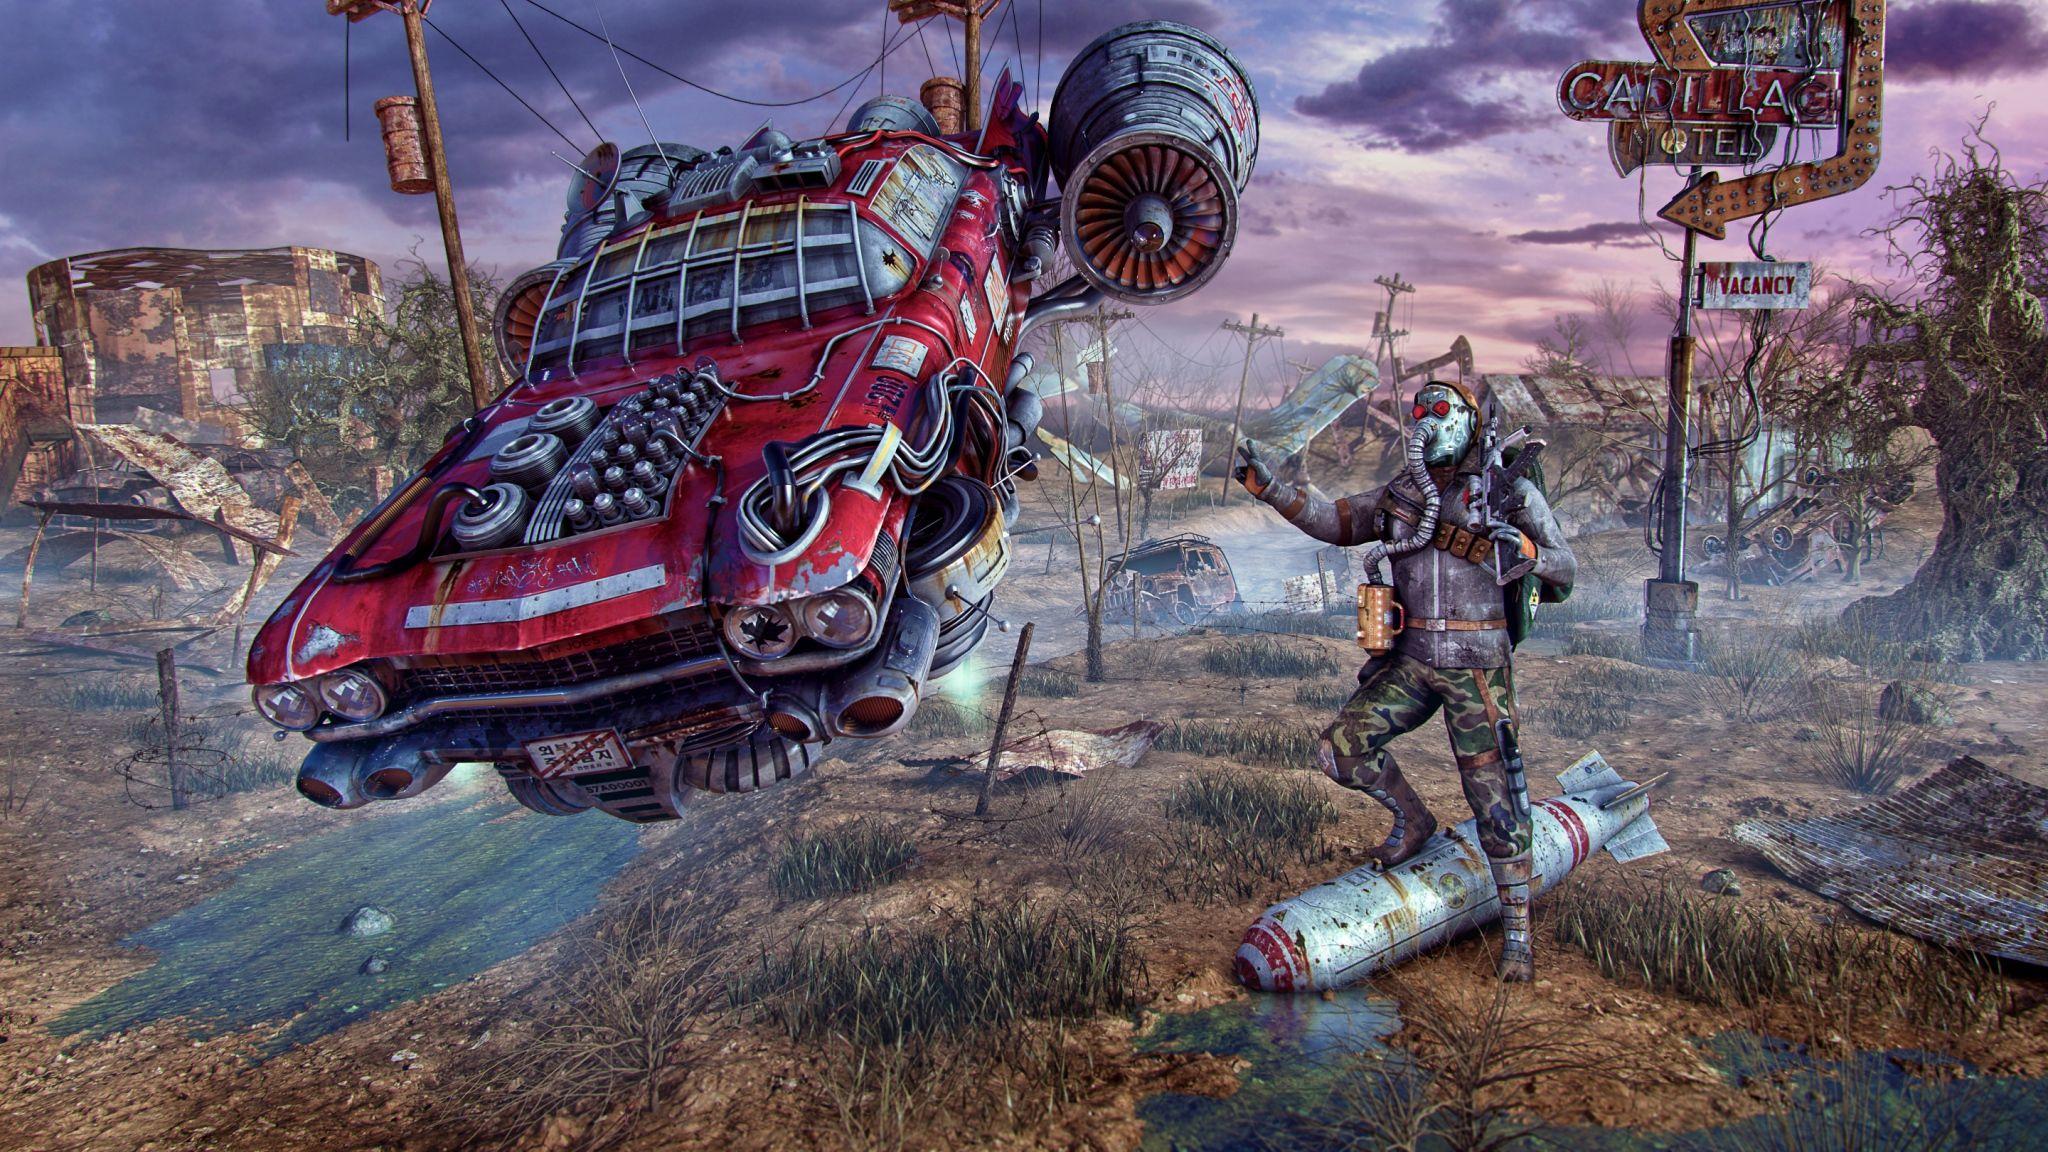 2048x1152 Wallpaper Fallout Wasteland Cars Flight Art Fantasy Cars Fallout Fan Art Fallout Wallpaper